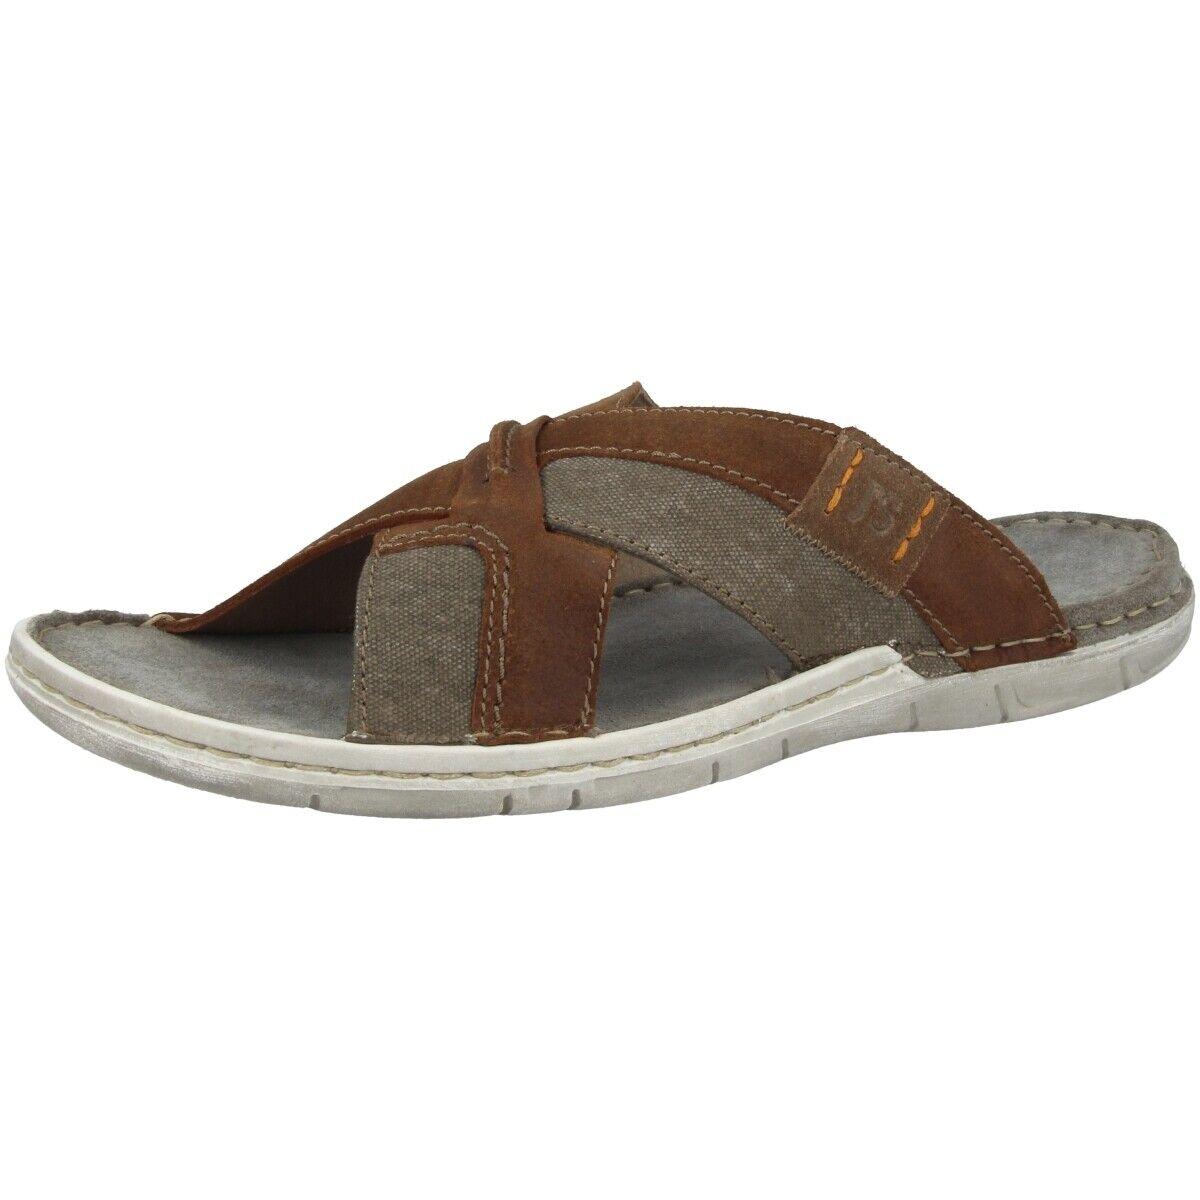 Josef Seibel Paul 96 Sandales Homme Mules Chaussures Pantoufle 43296-977-351